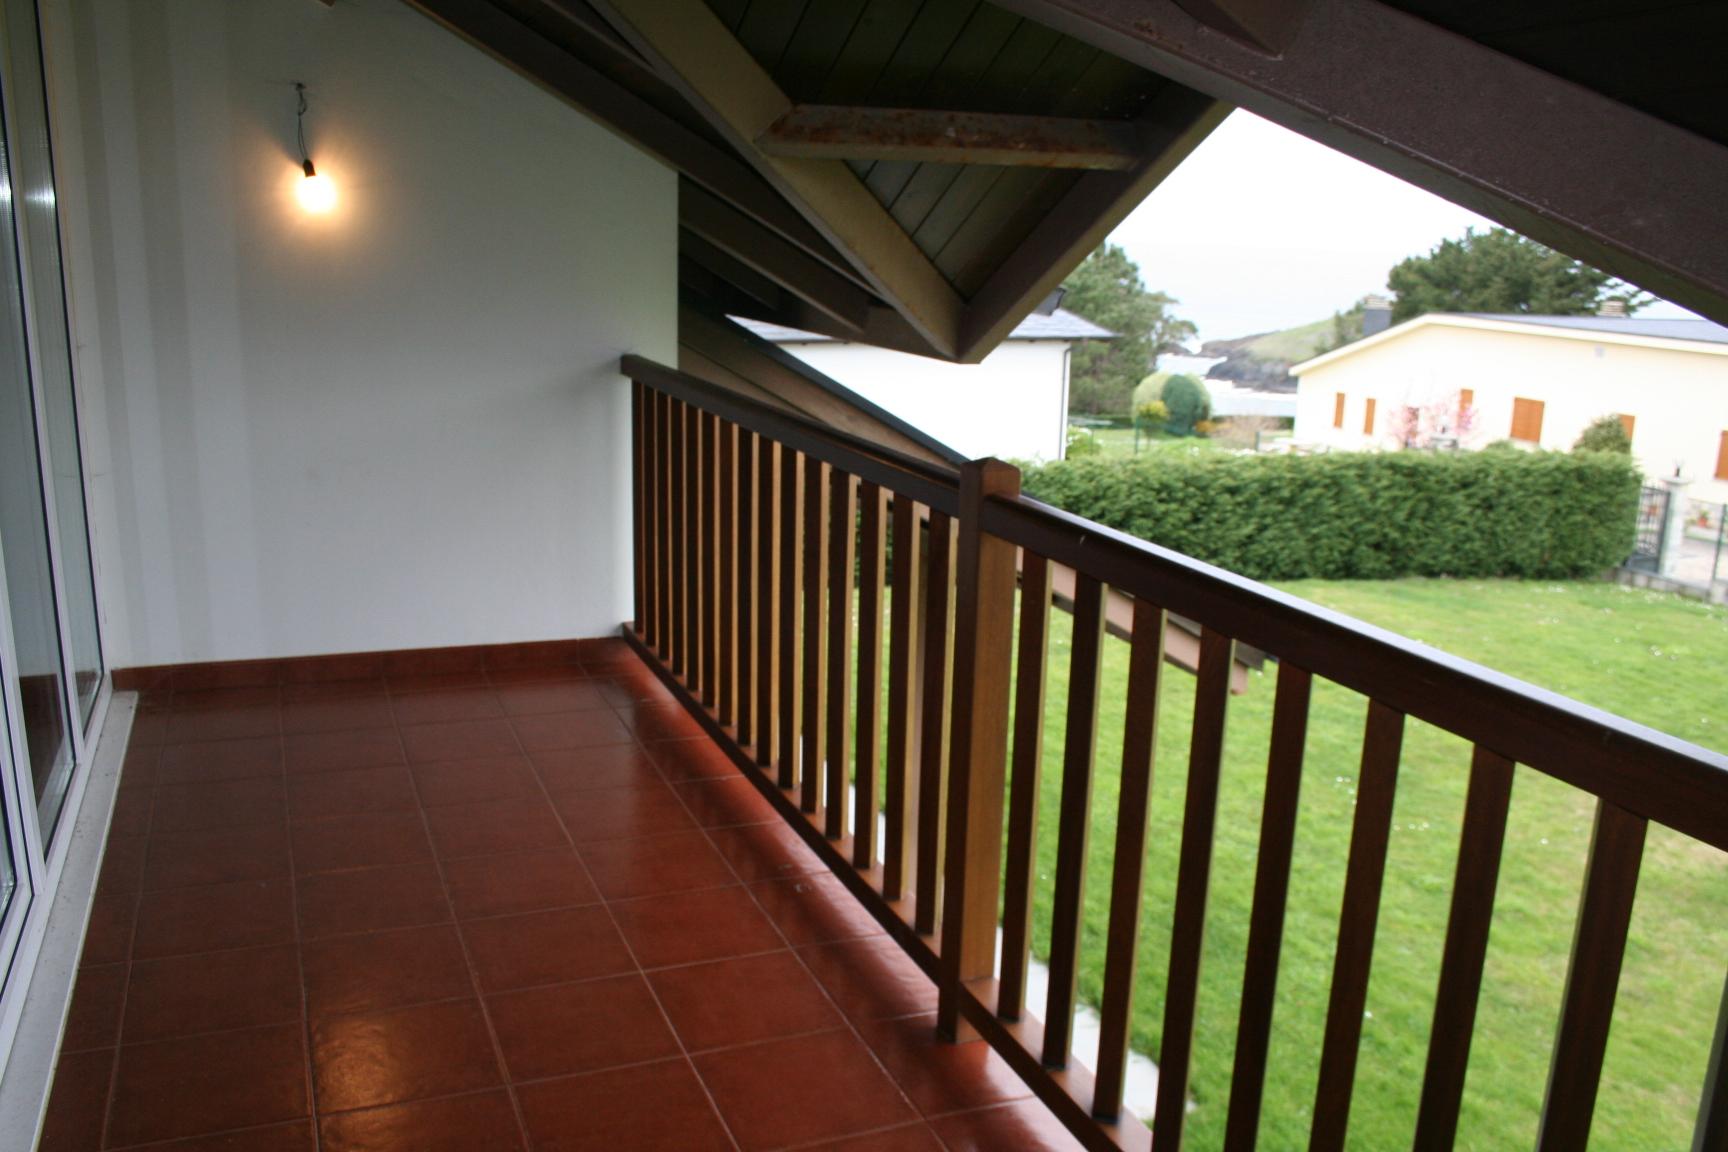 16-Loft planta alta con terraza